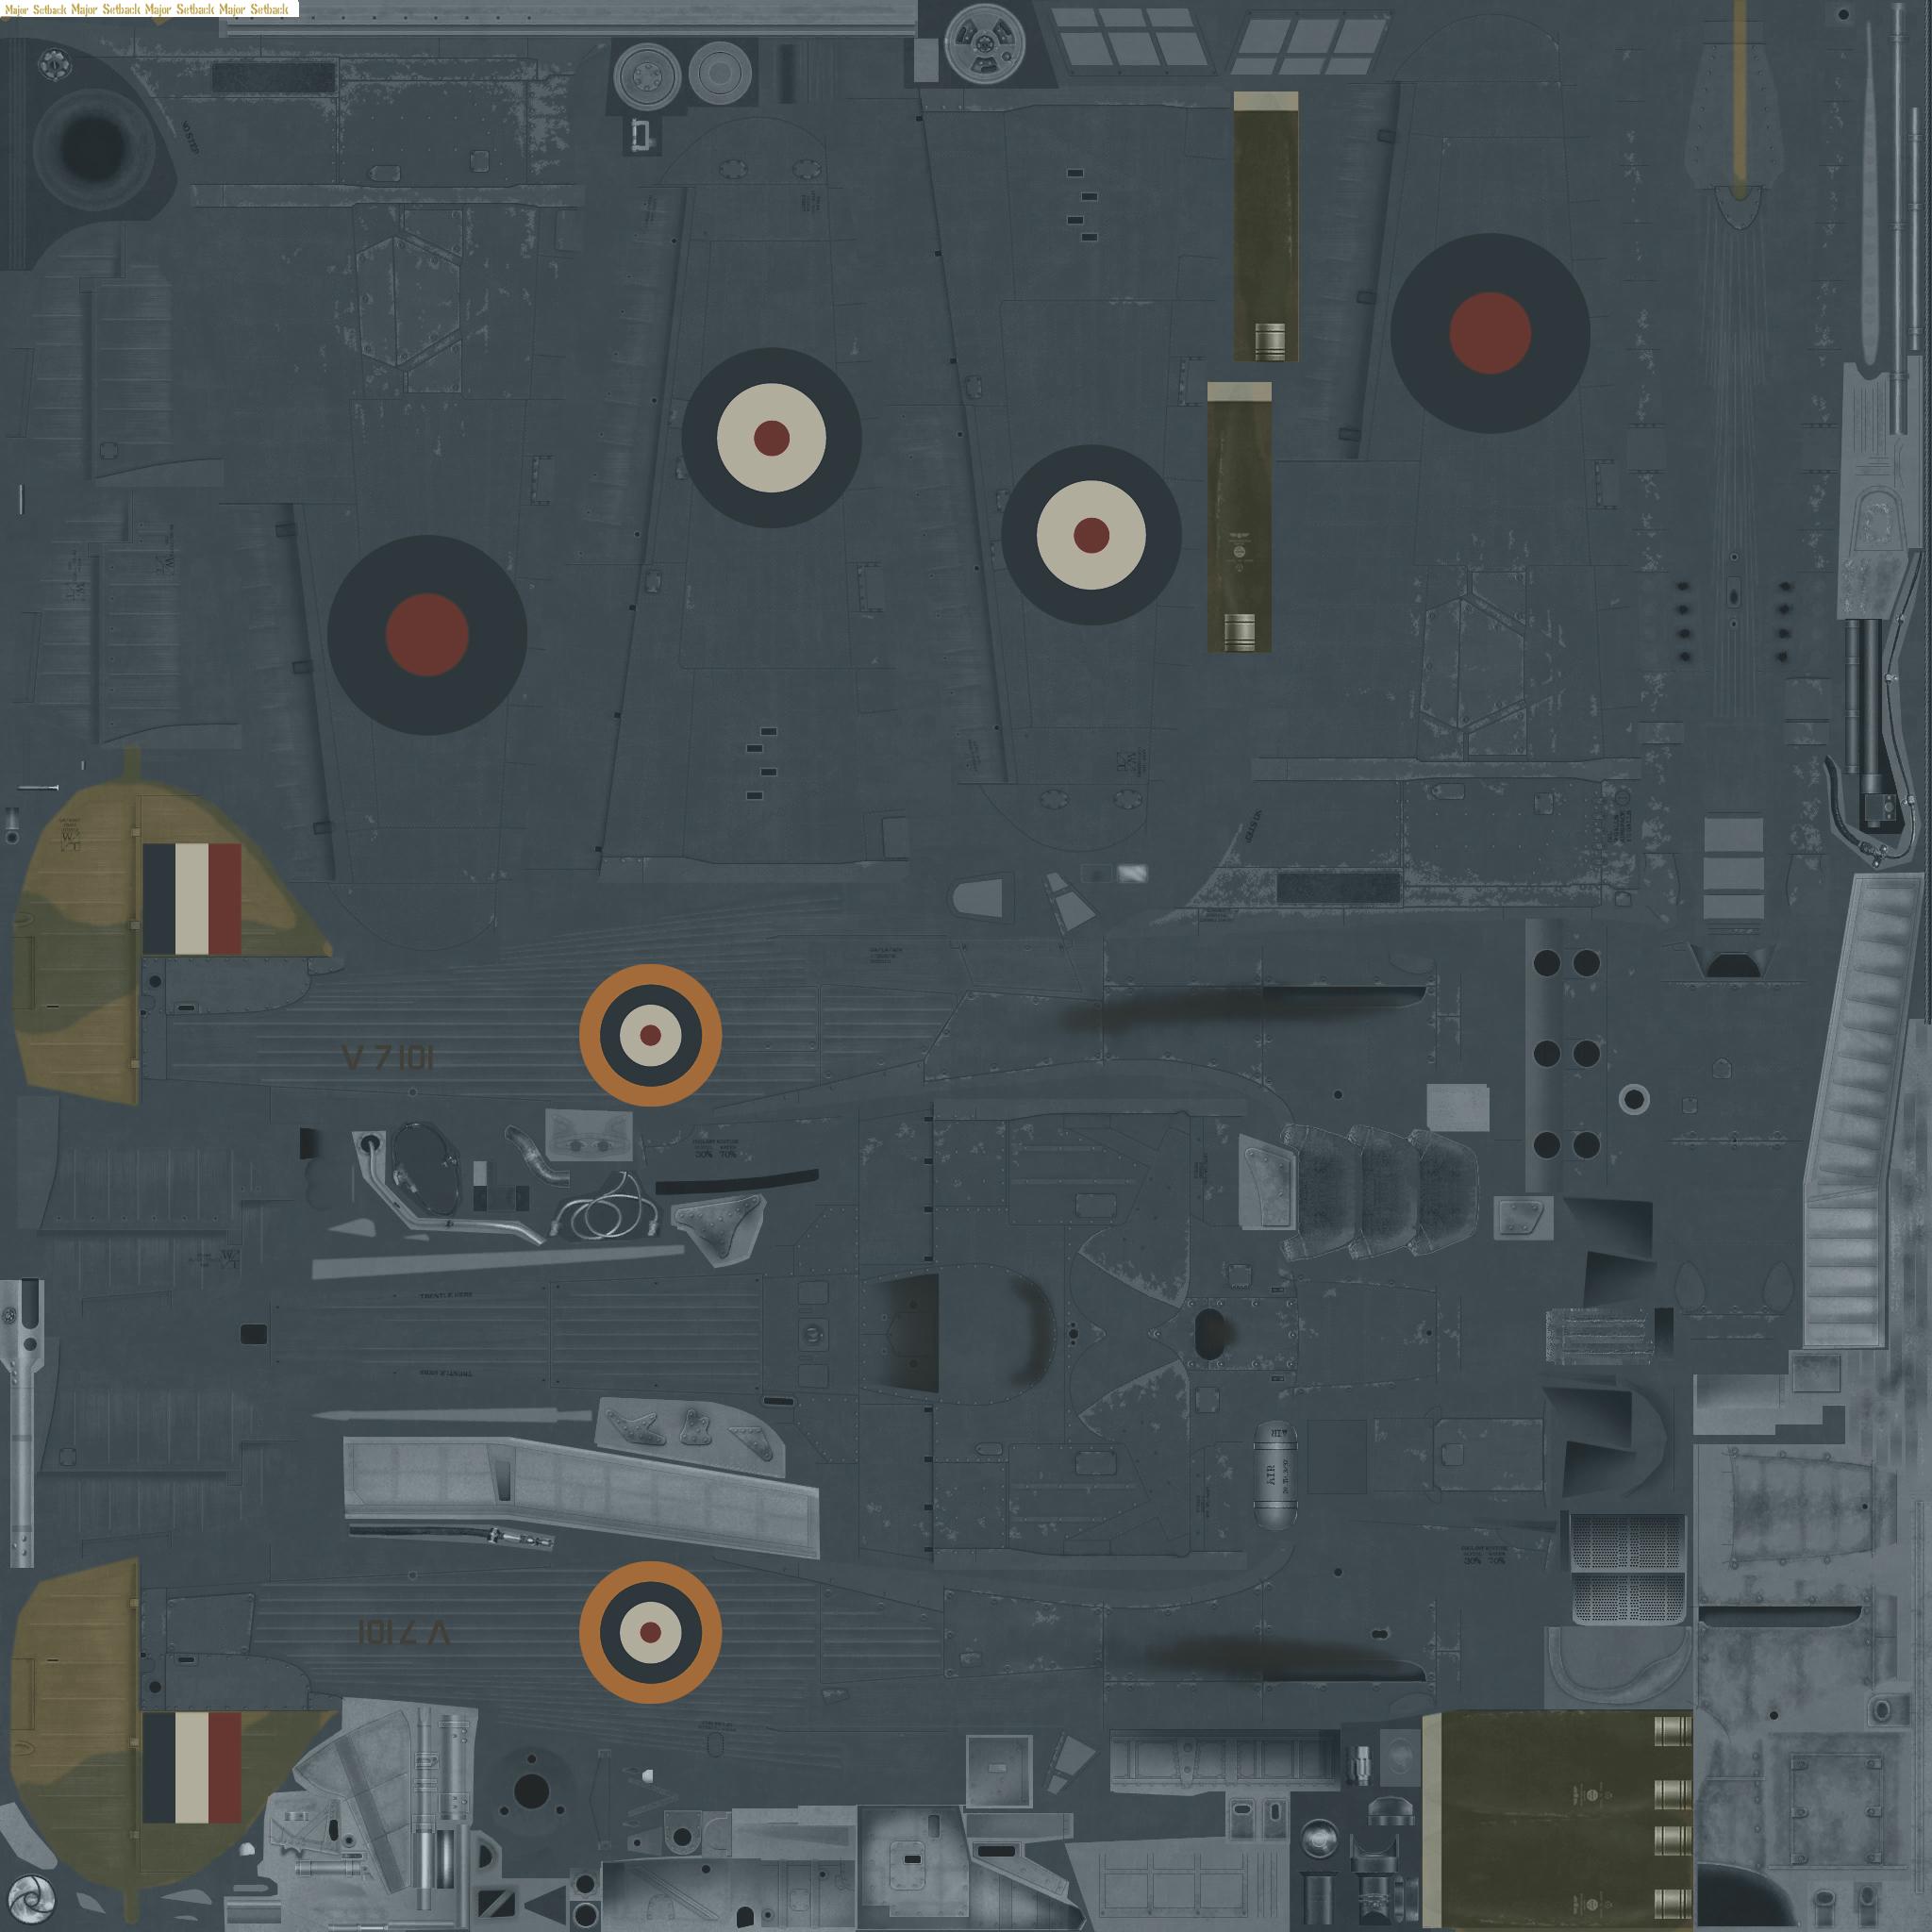 COD MS Hurricane I RAF 69Sqn Flt Lt G Burges V7101 Malta May 1941